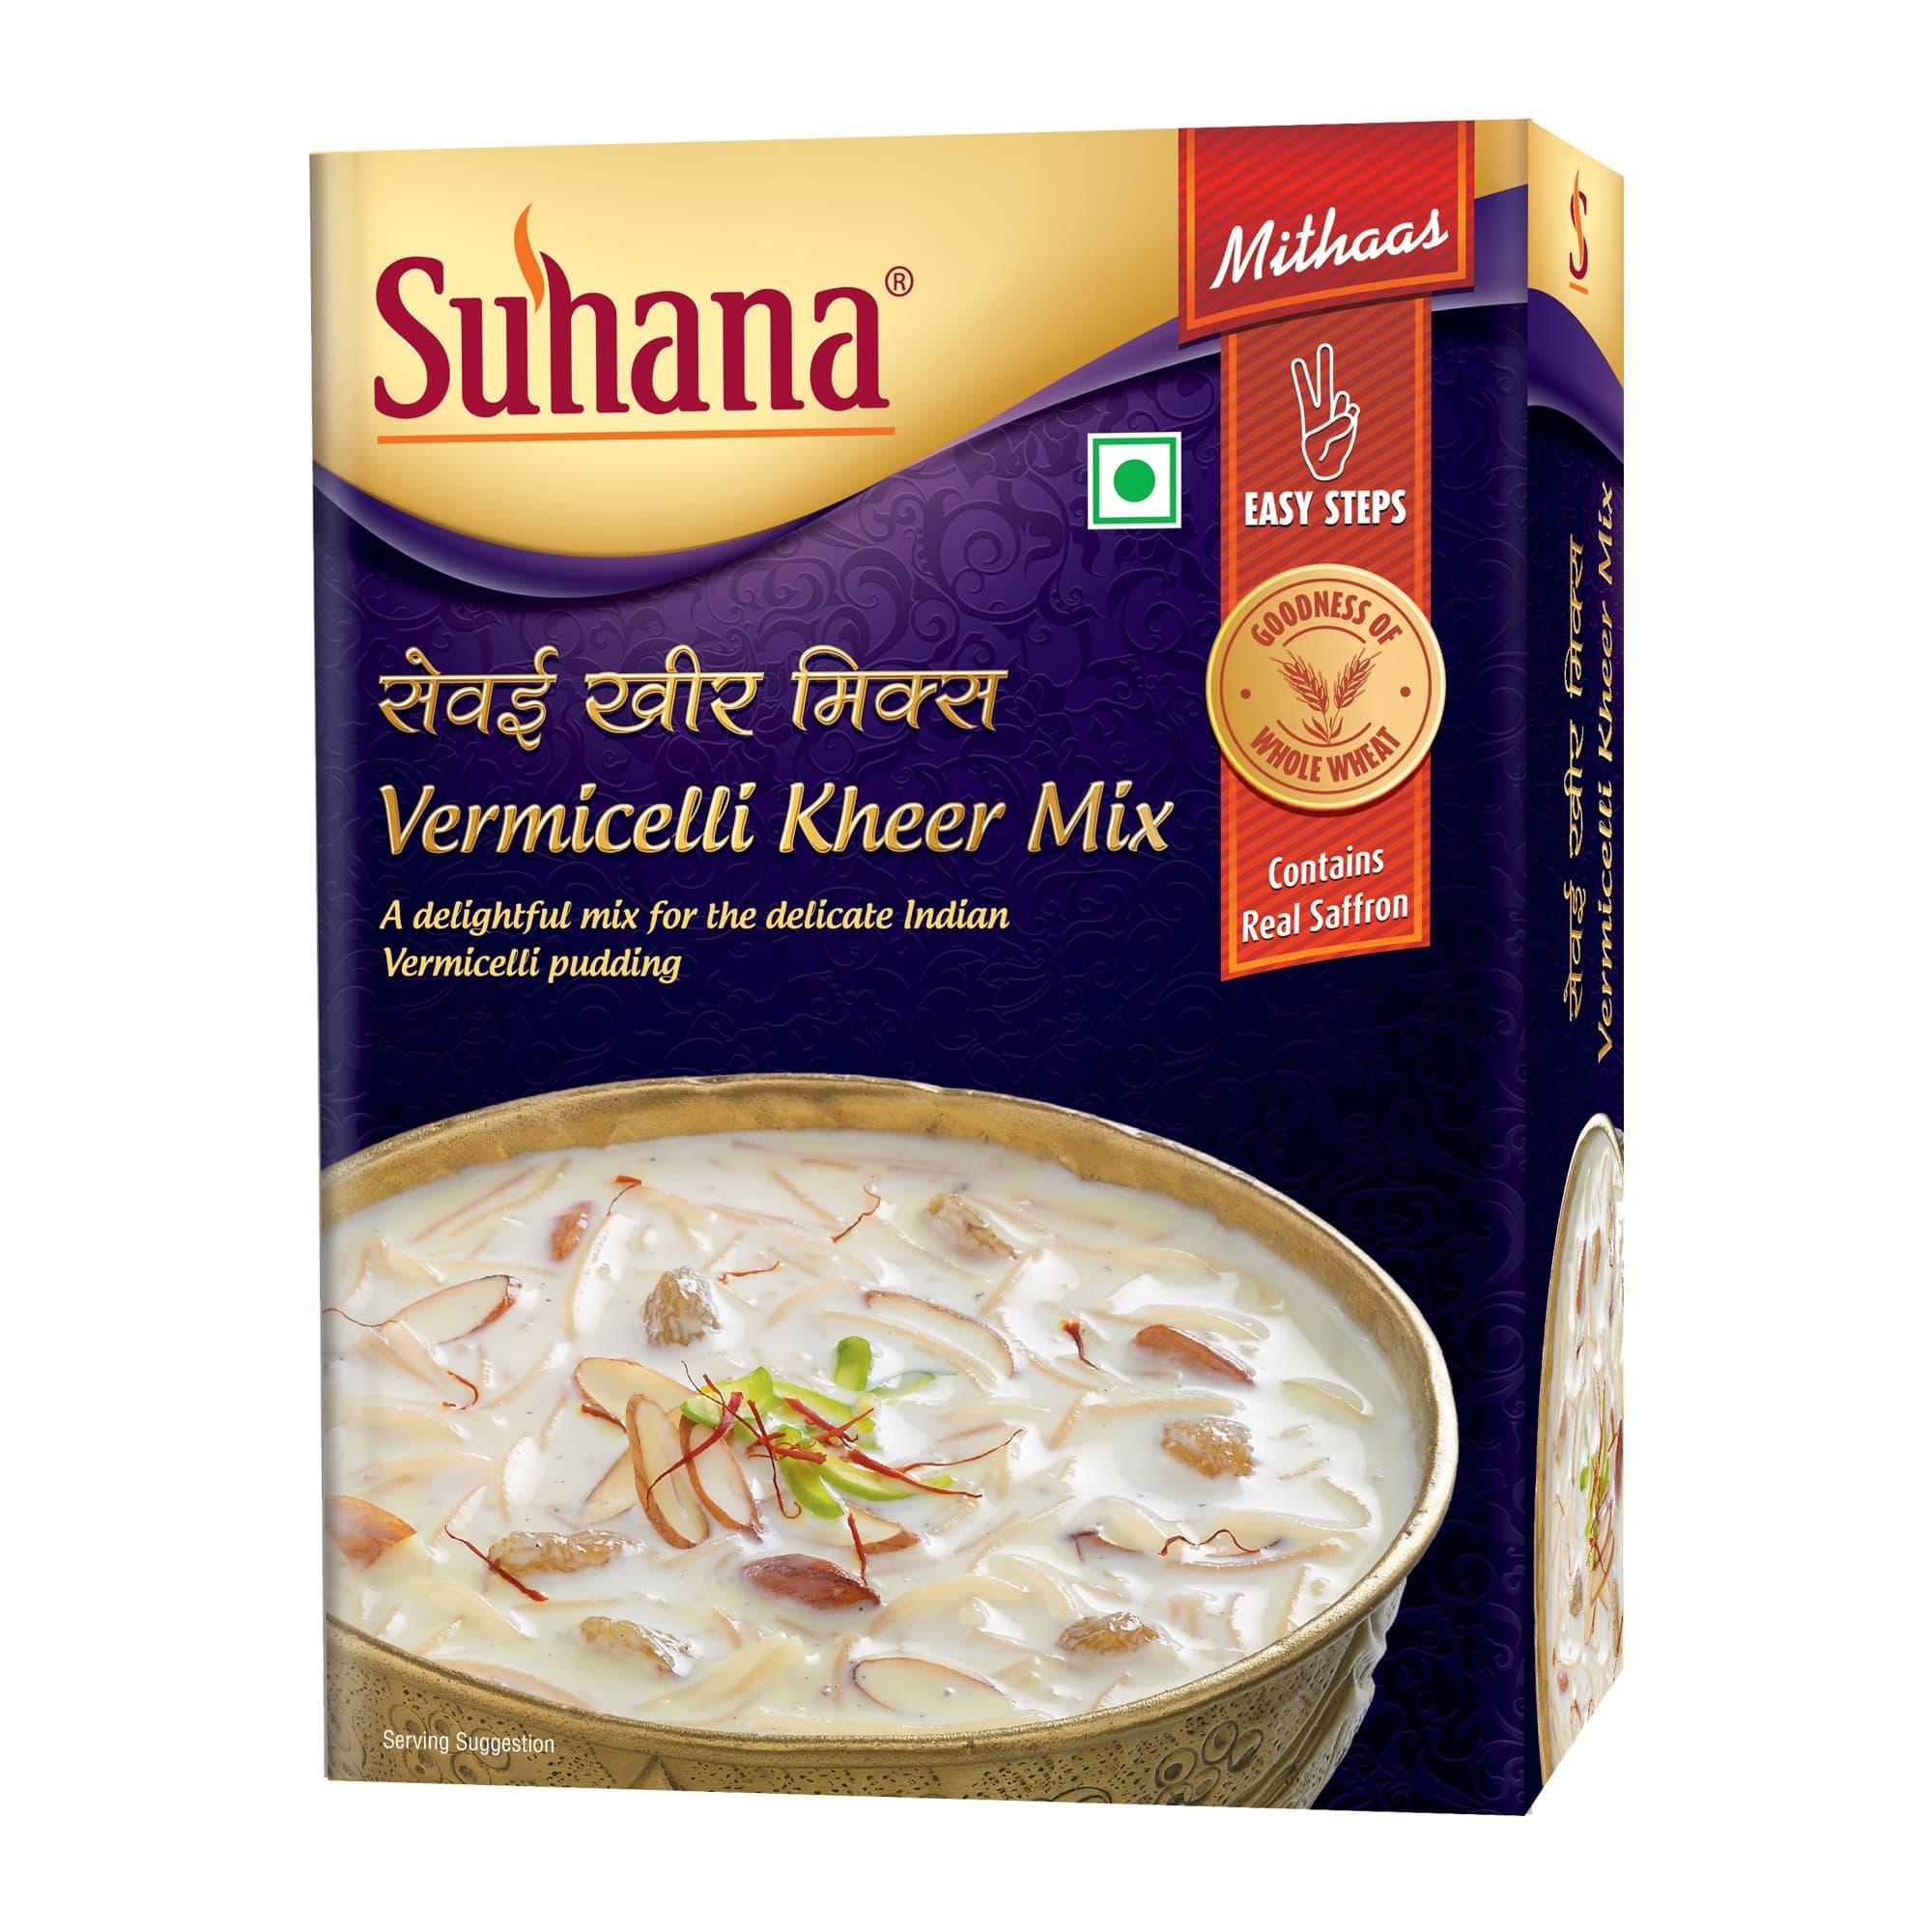 Suhana Vermicelli Kheer Mix 150 g Box